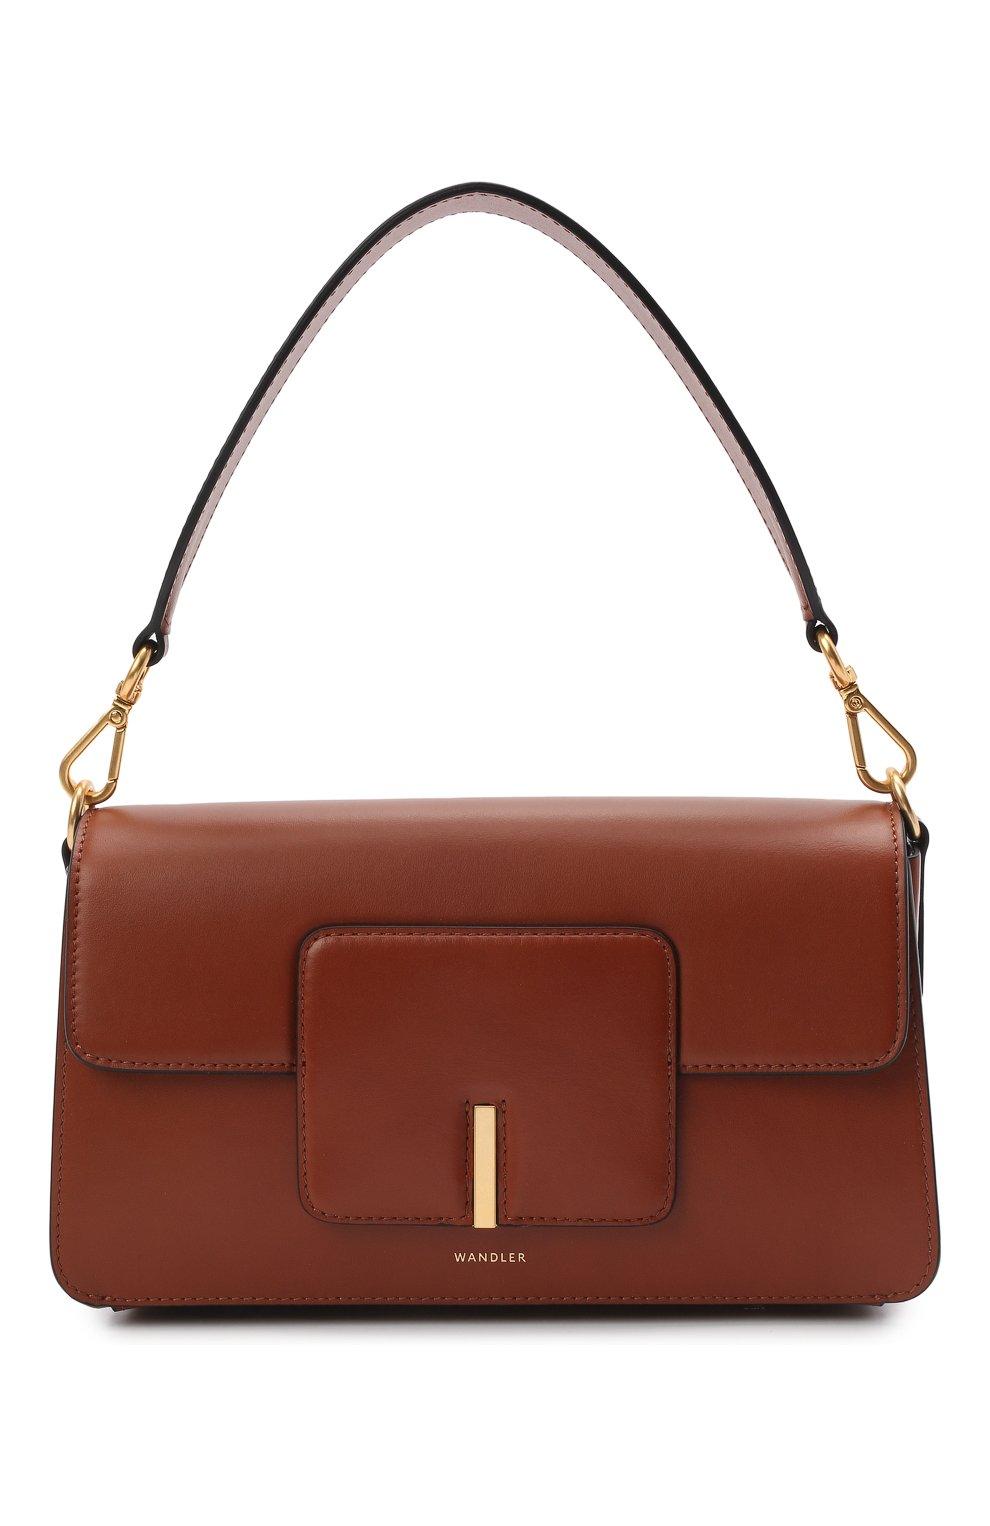 Женская сумка georgia WANDLER коричневого цвета, арт. GE0RGIA BAG   Фото 1 (Сумки-технические: Сумки через плечо, Сумки top-handle; Материал: Натуральная кожа; Размер: small)